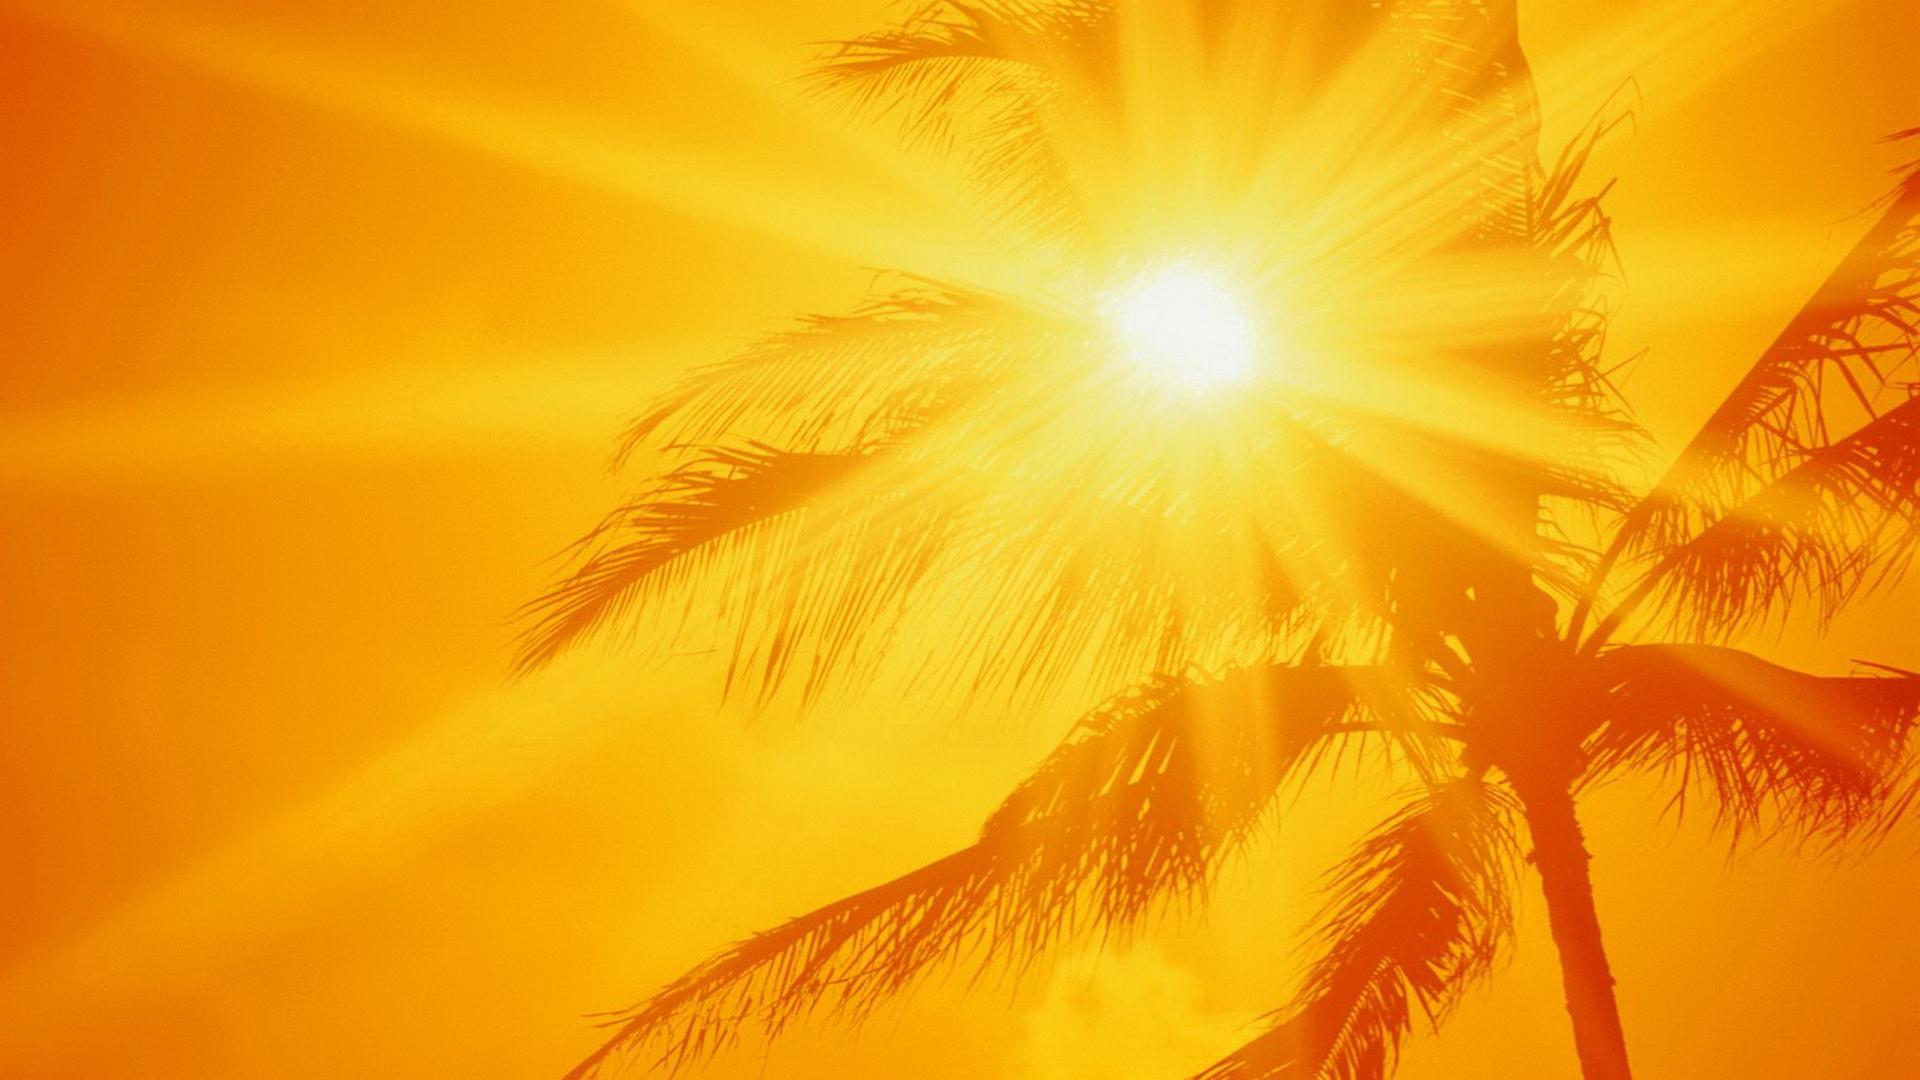 The Summer Heat Wallpapers Feel The Summer Heat Myspace Backgrounds 1920x1080